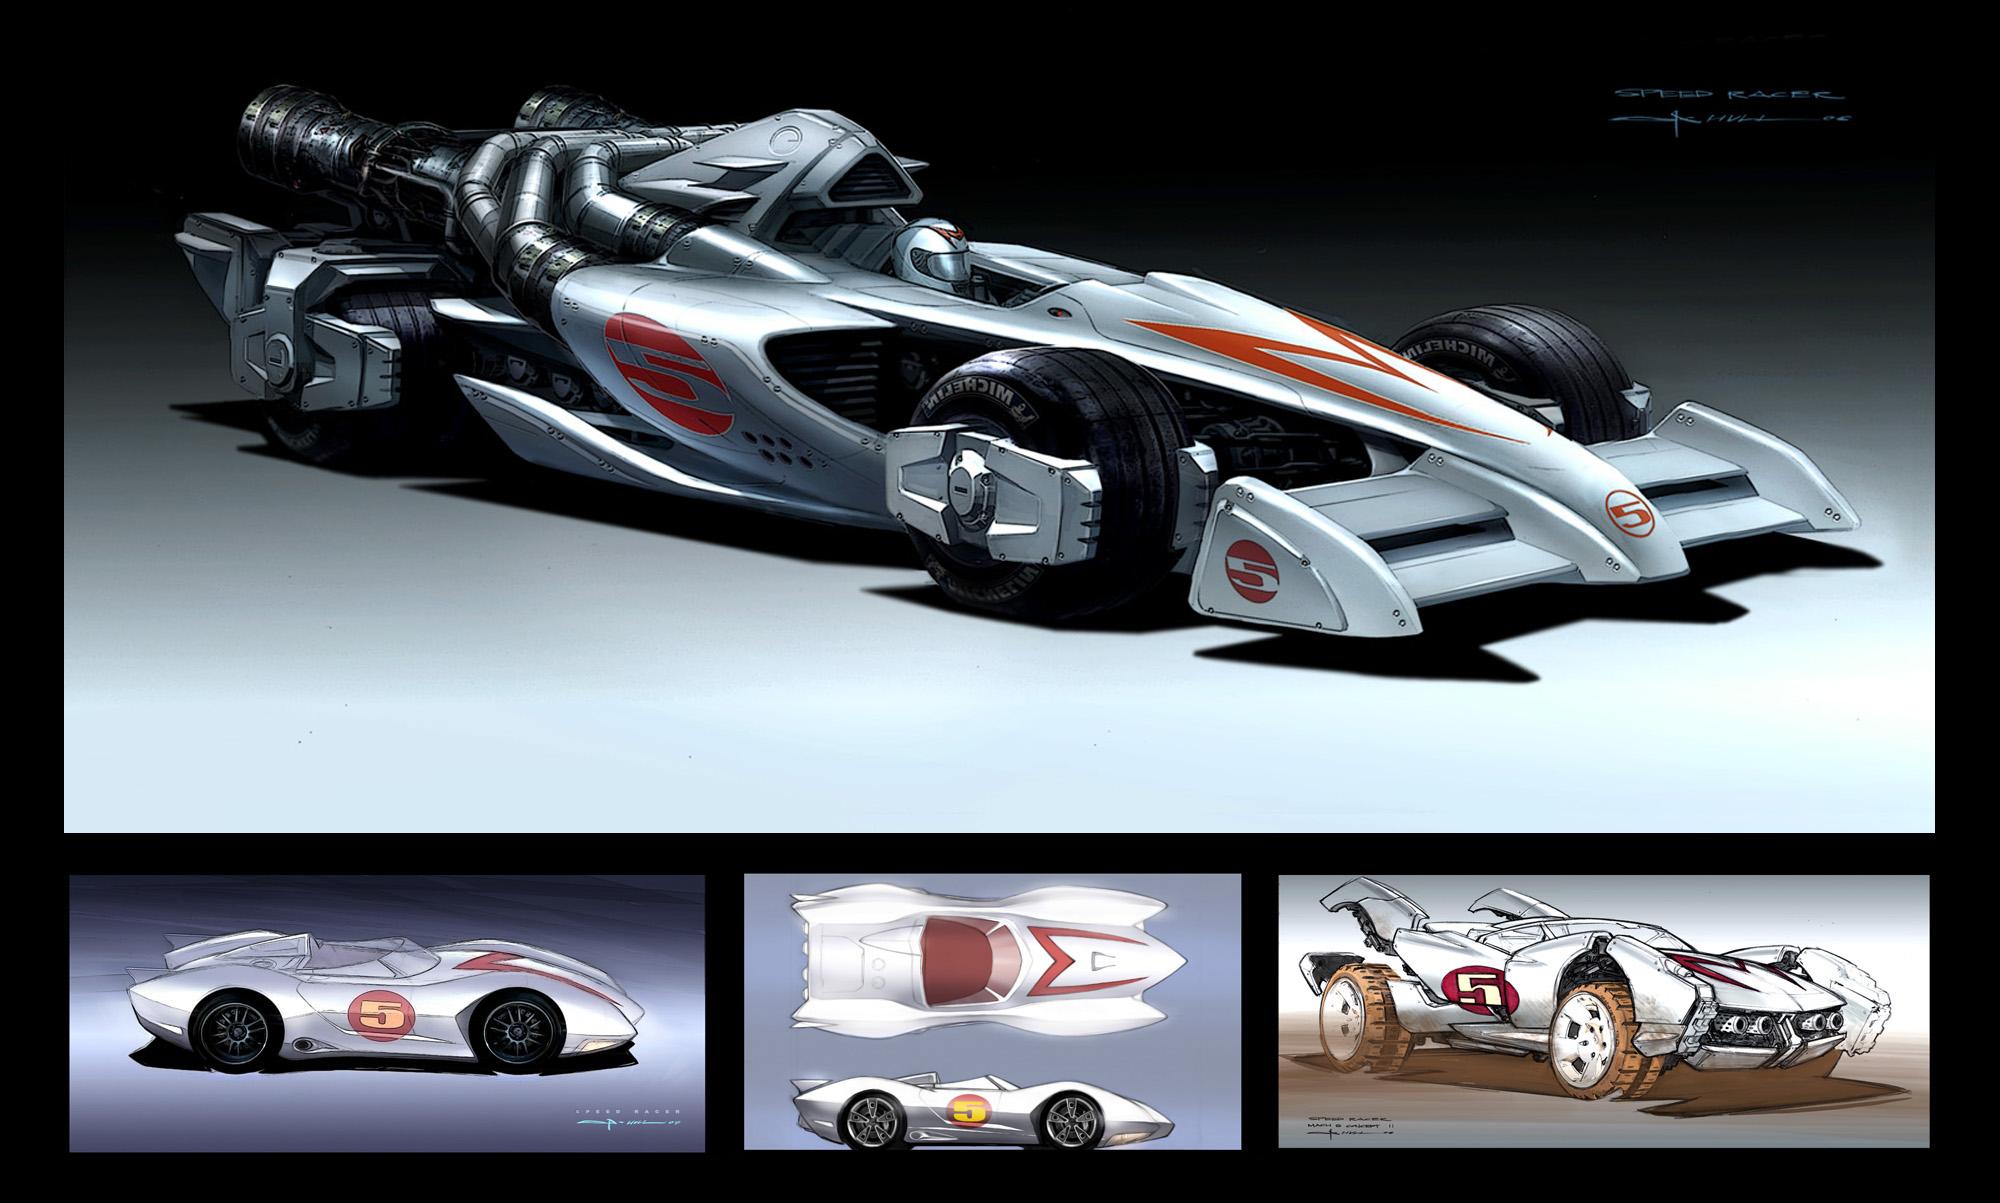 speed_CarsConceptsPageB_04 copy.jpg